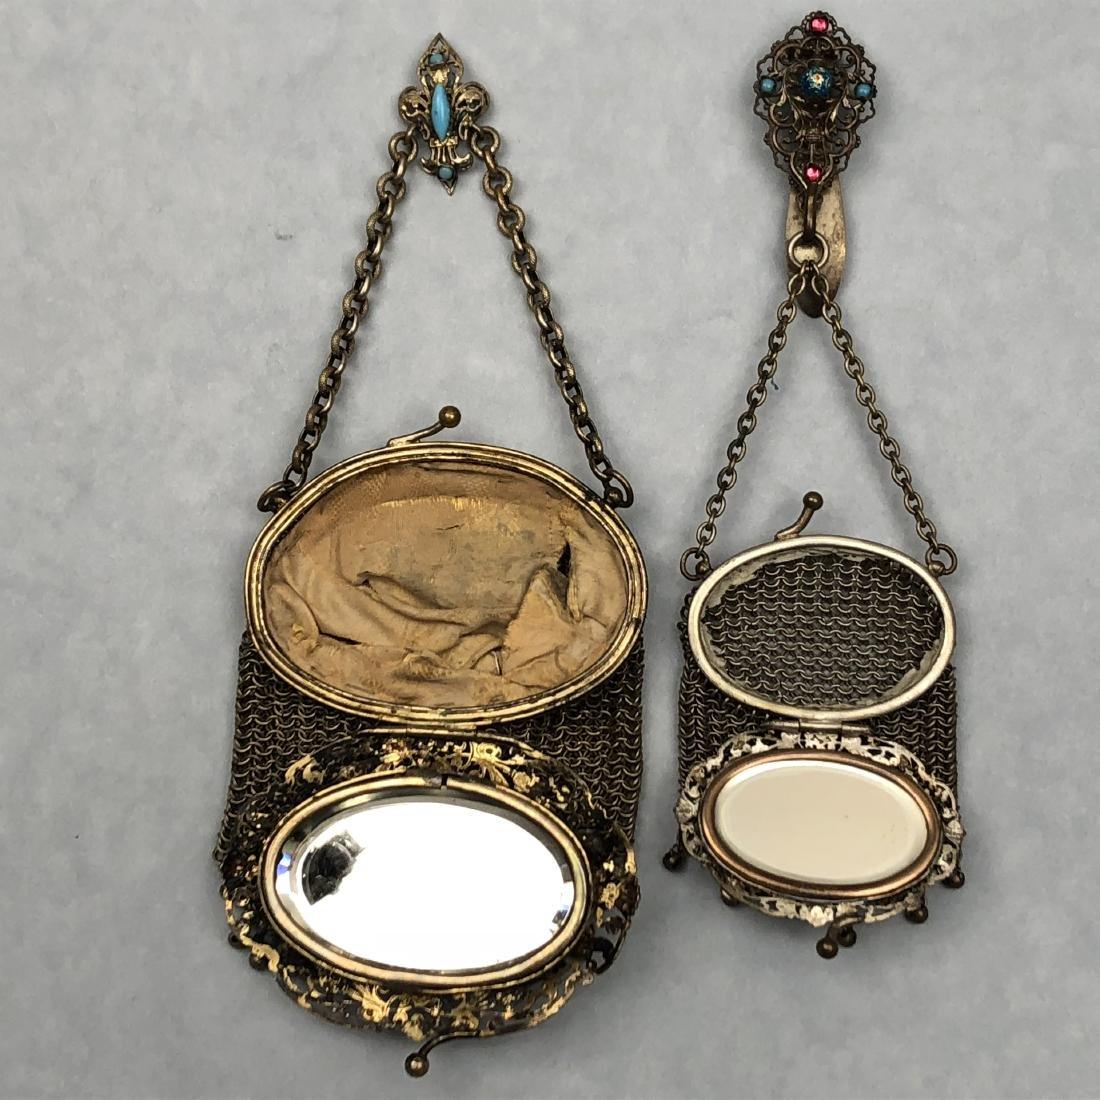 TWO HINGED-LID METAL MESH PURSES, 1890s - 2